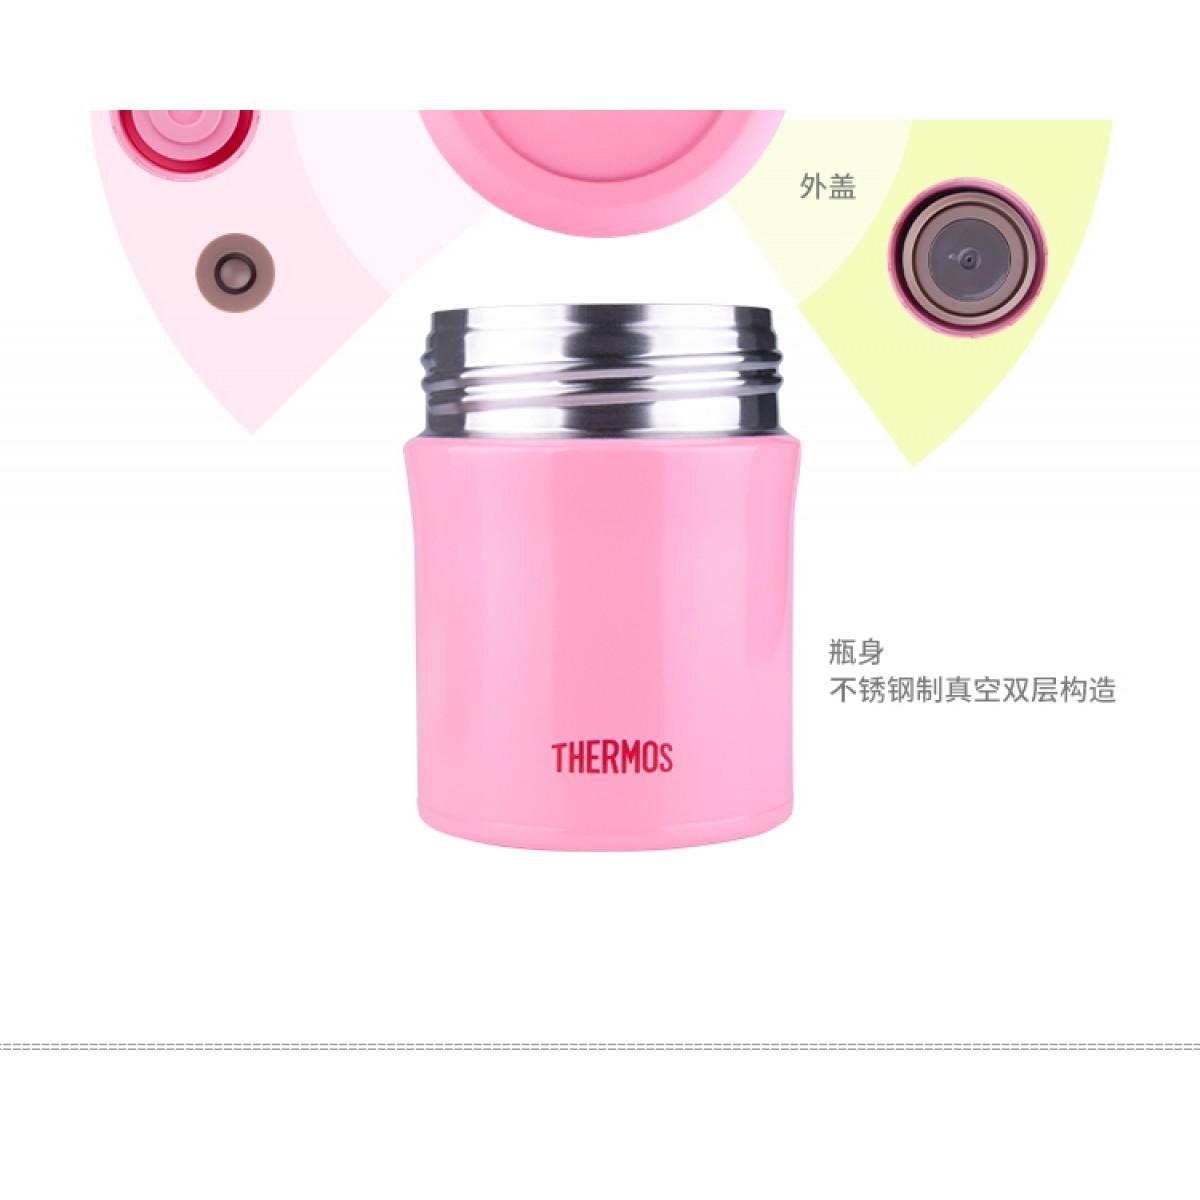 Thermos JBJ-302 Stylish Food Jar 300ml + FHI-250 Disney Sippy Cup with Handle 250ml (Pink/Blue) SET